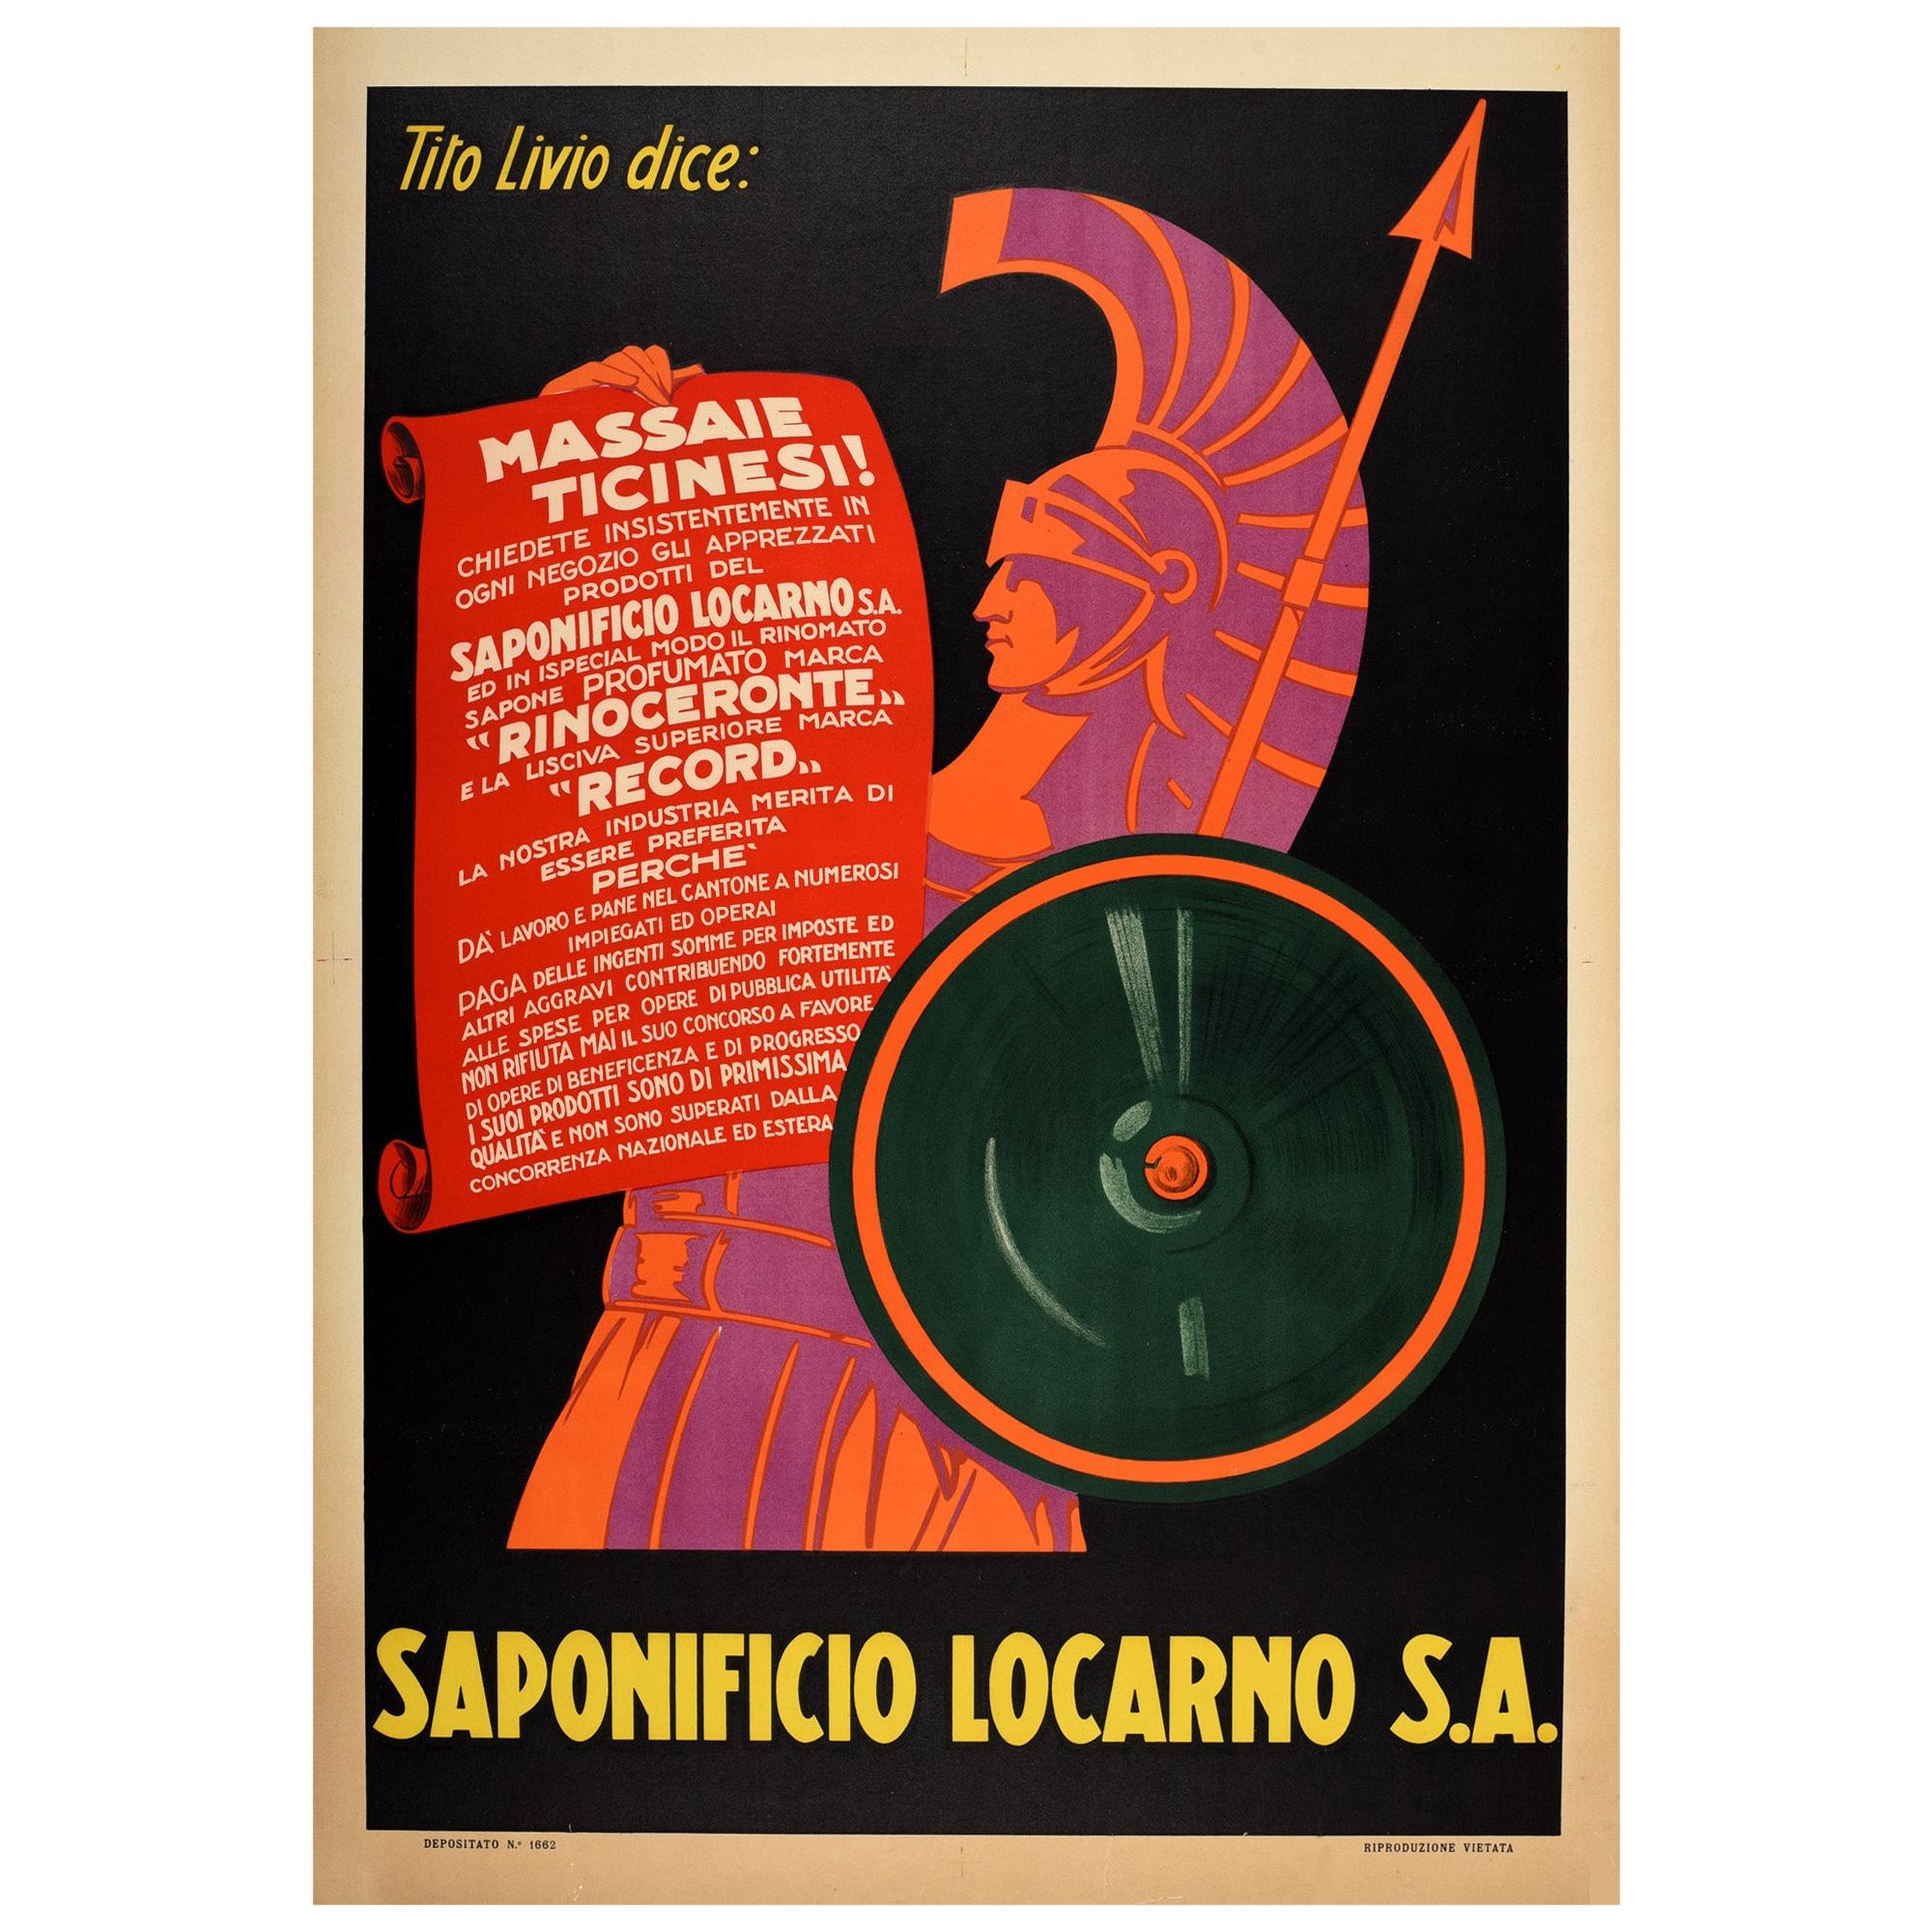 Original Vintage Advertising Poster For Saponificio Locarno Roman Warrior Design